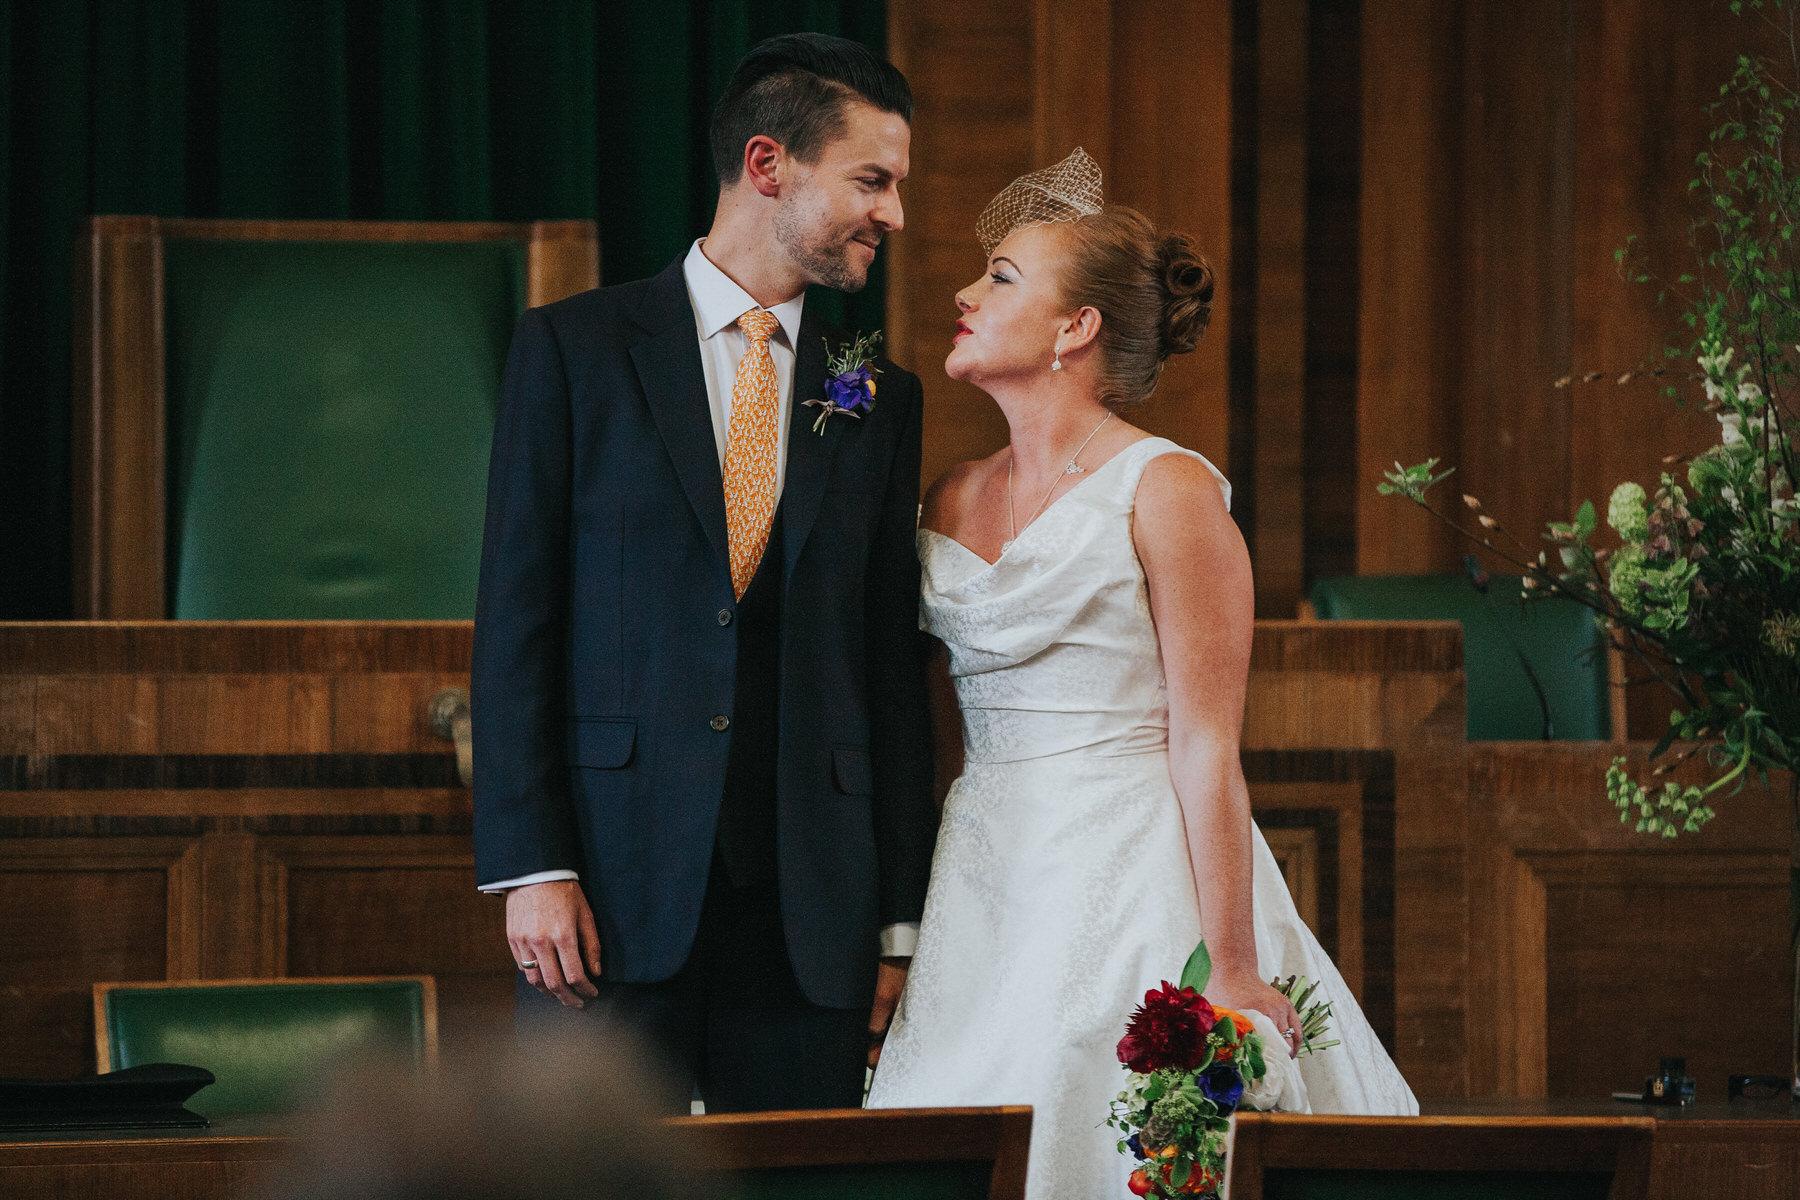 newly-married-bride-groom-wedding-Hackney-alternative-photographer-.jpg